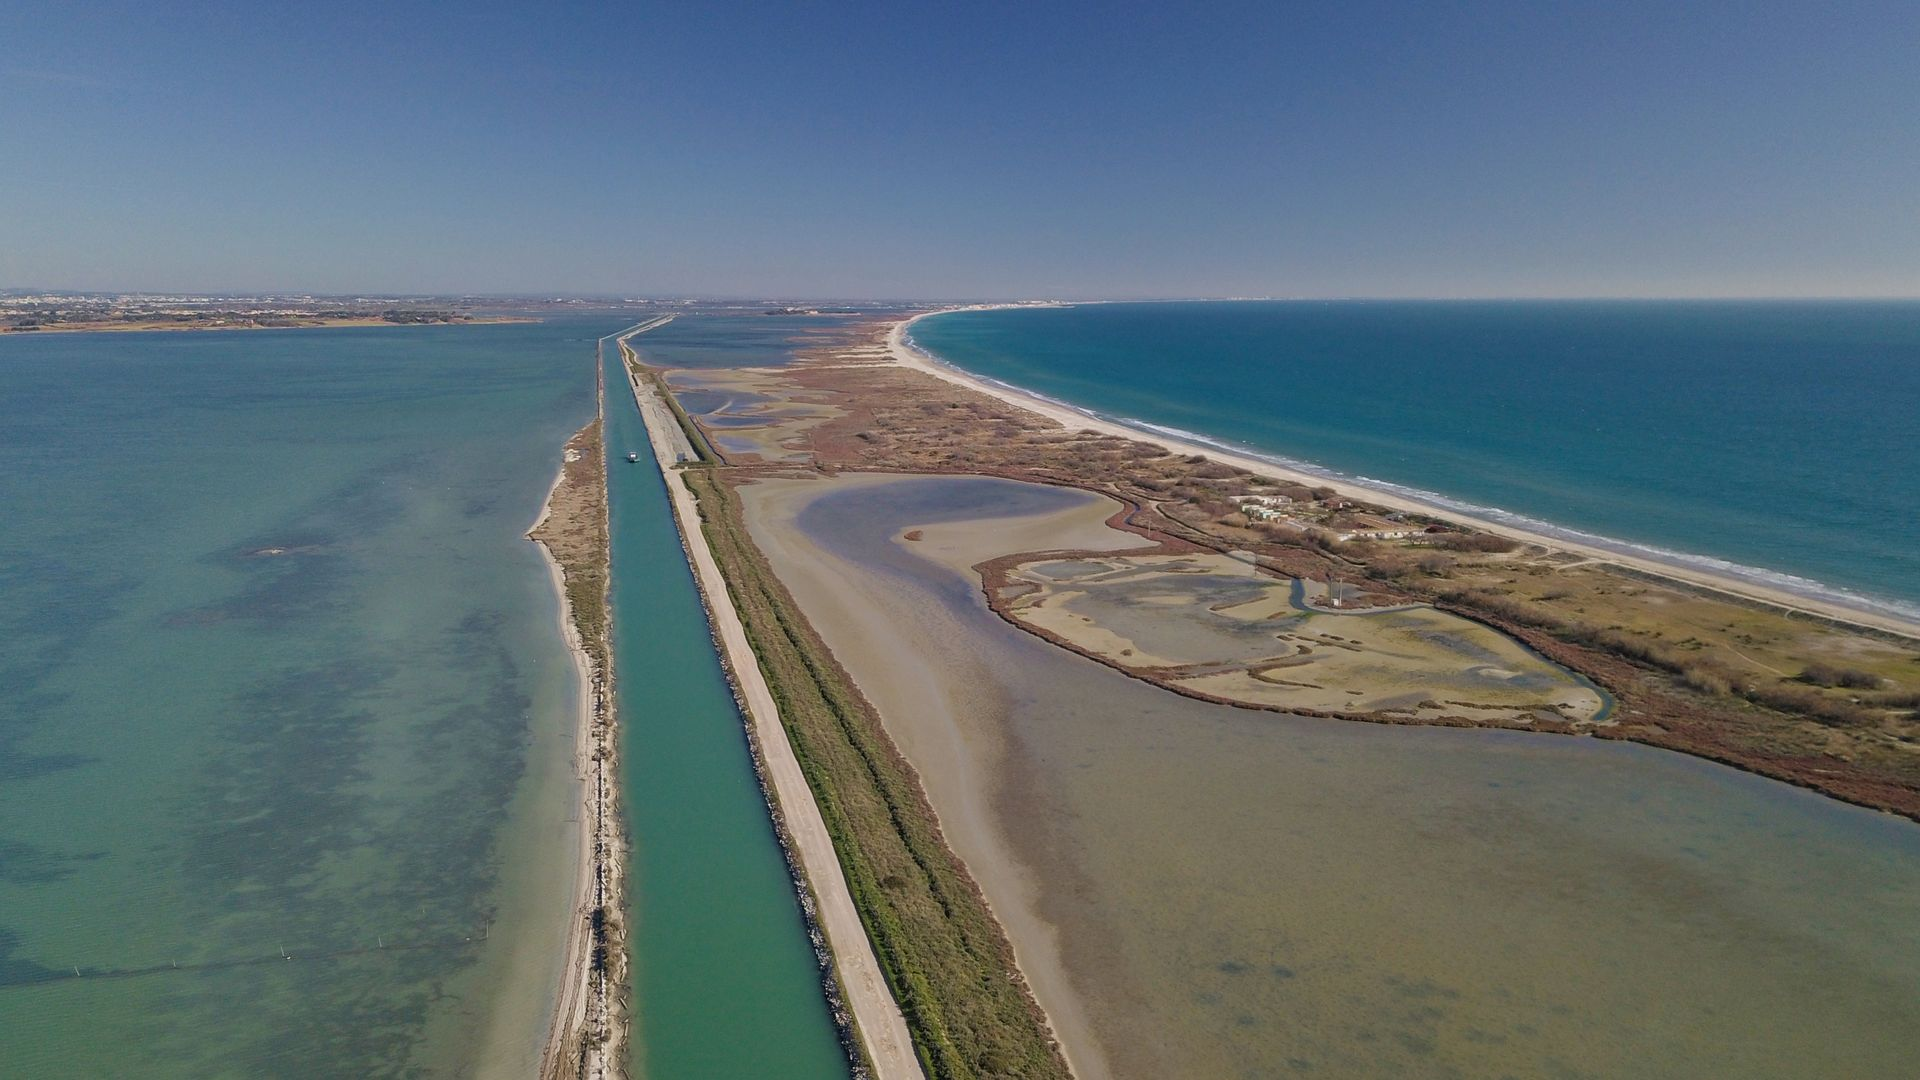 Mer, étangs et canal du Rhône à Sète